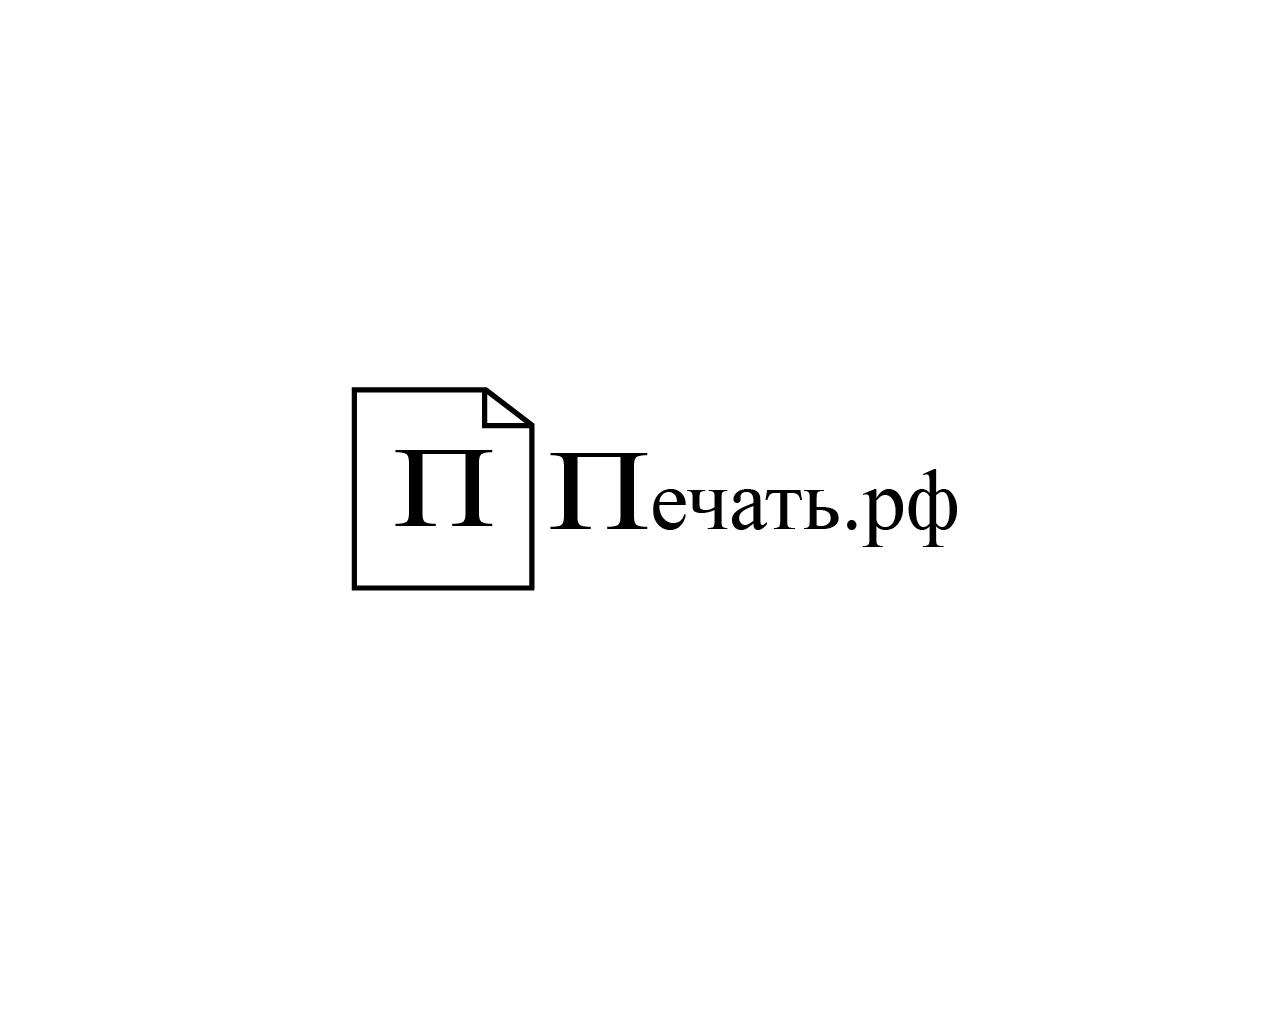 Логотип для веб-сервиса интерьерной печати и оперативной пол фото f_9355d291a8e91f75.png